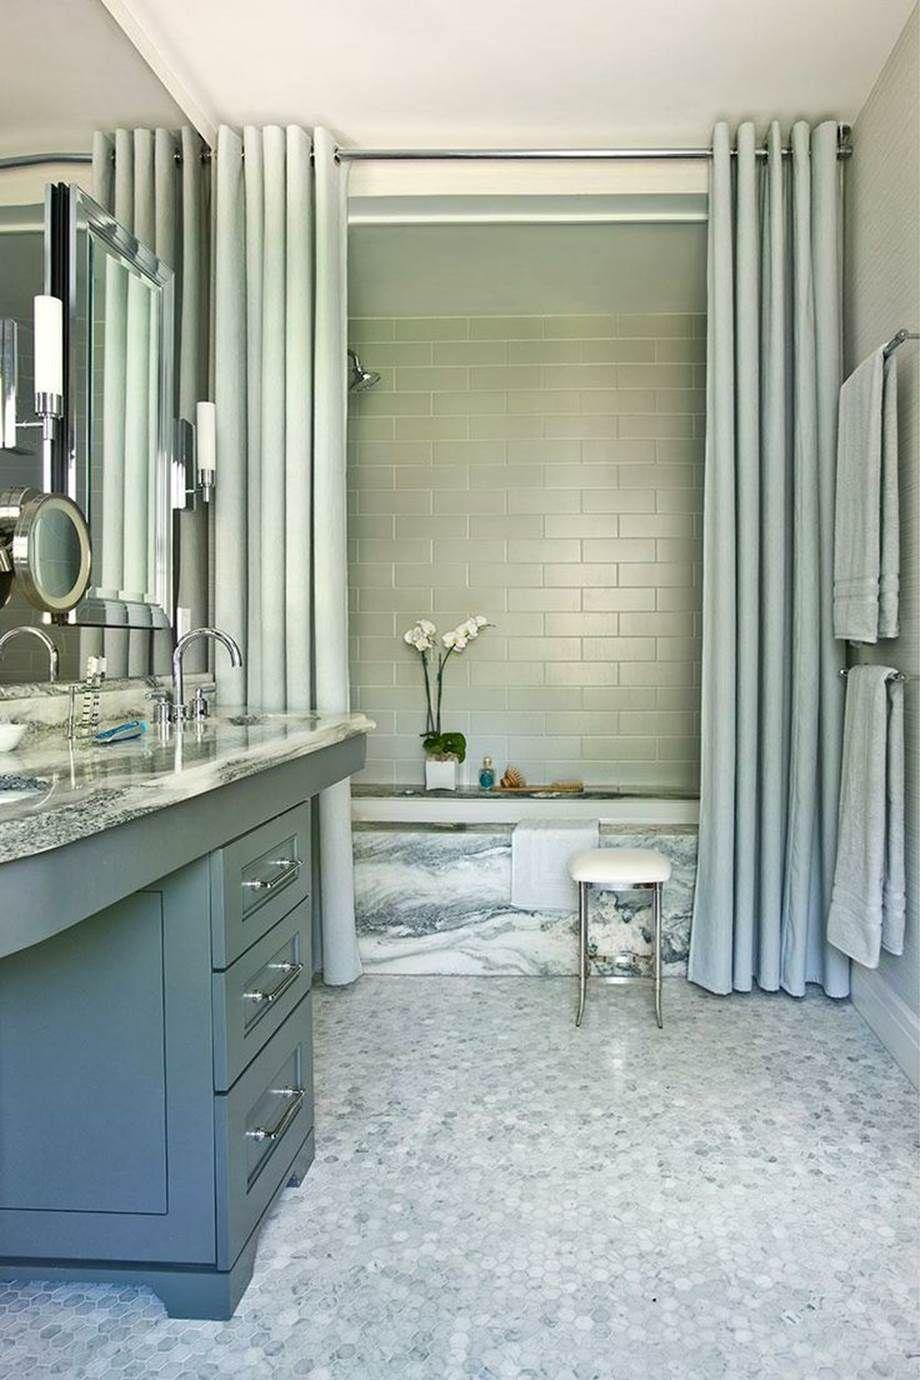 Huffington How To Design Tips And Secrets The Artful Lifestyle Blog Bathroom Renovation Trends Bathroom Design Bathrooms Remodel